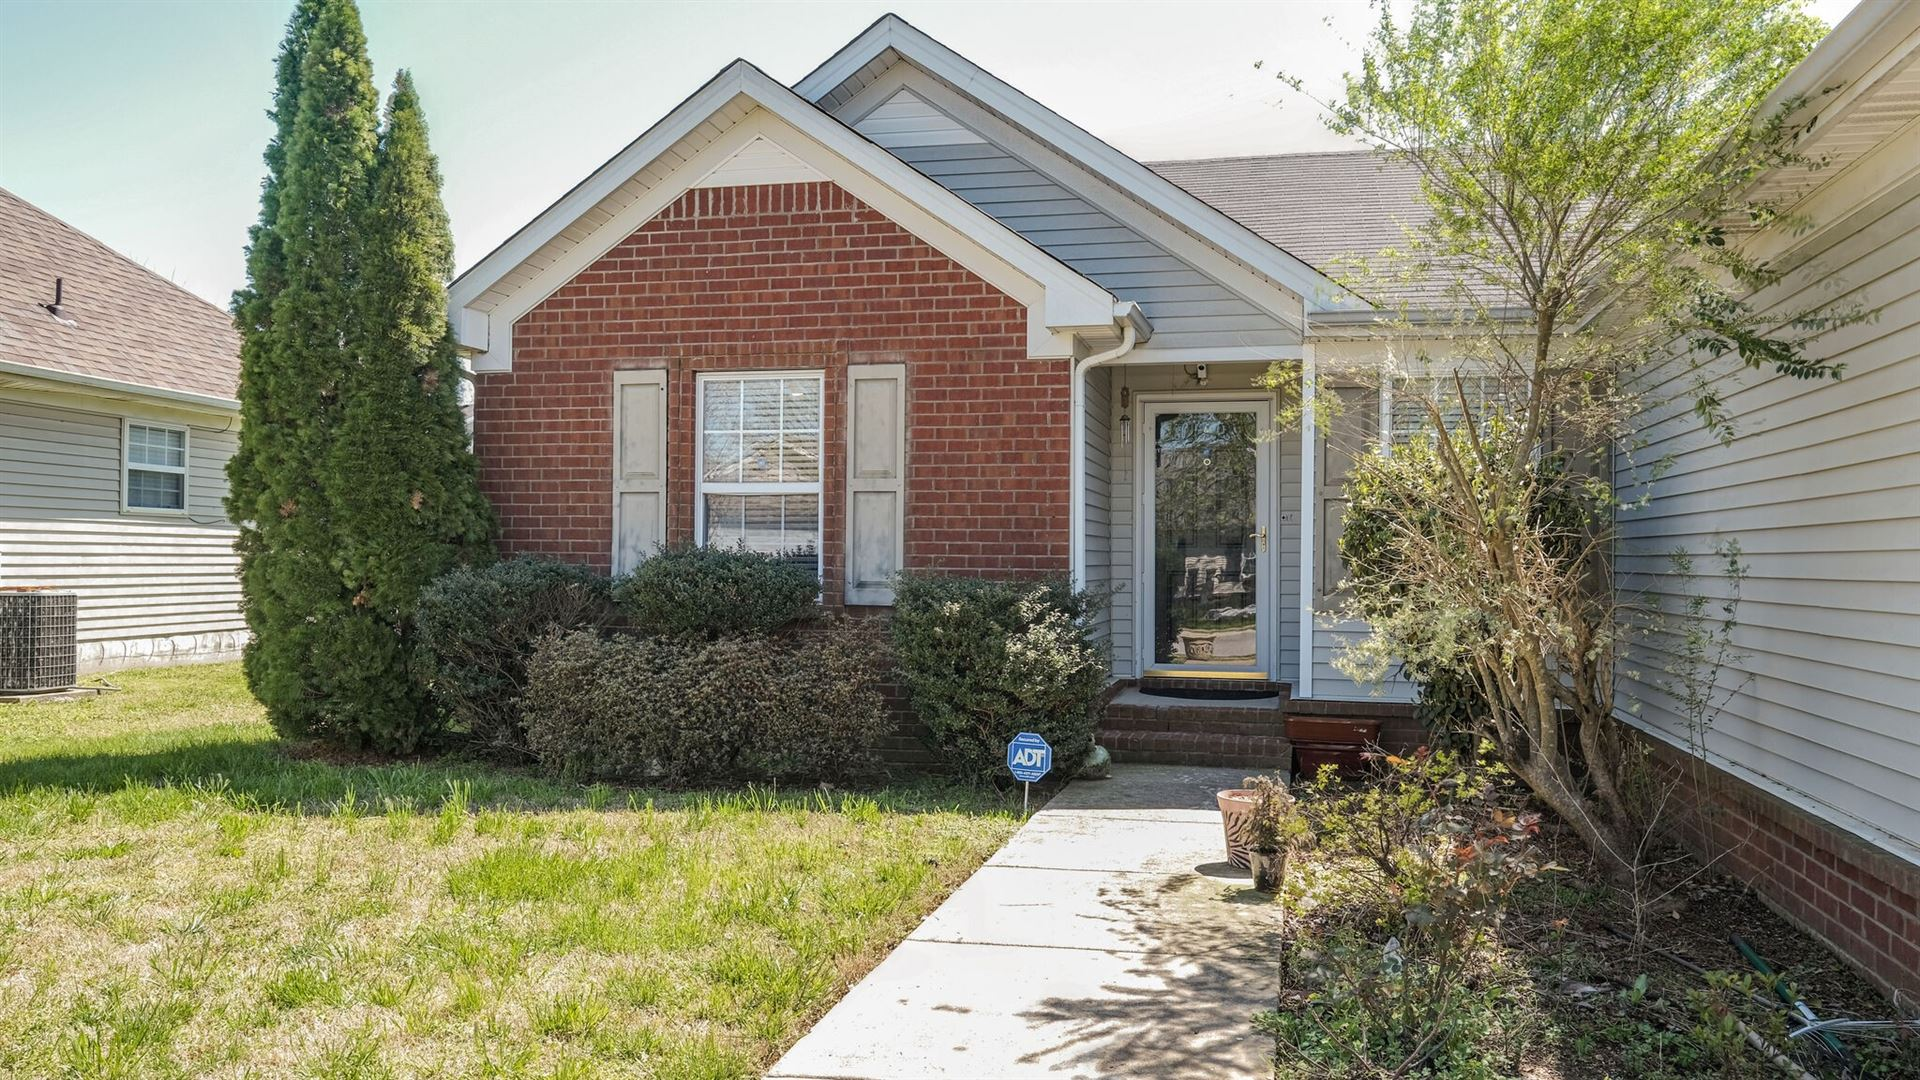 Photo of 2123 Cason Trl, Murfreesboro, TN 37128 (MLS # 2243072)